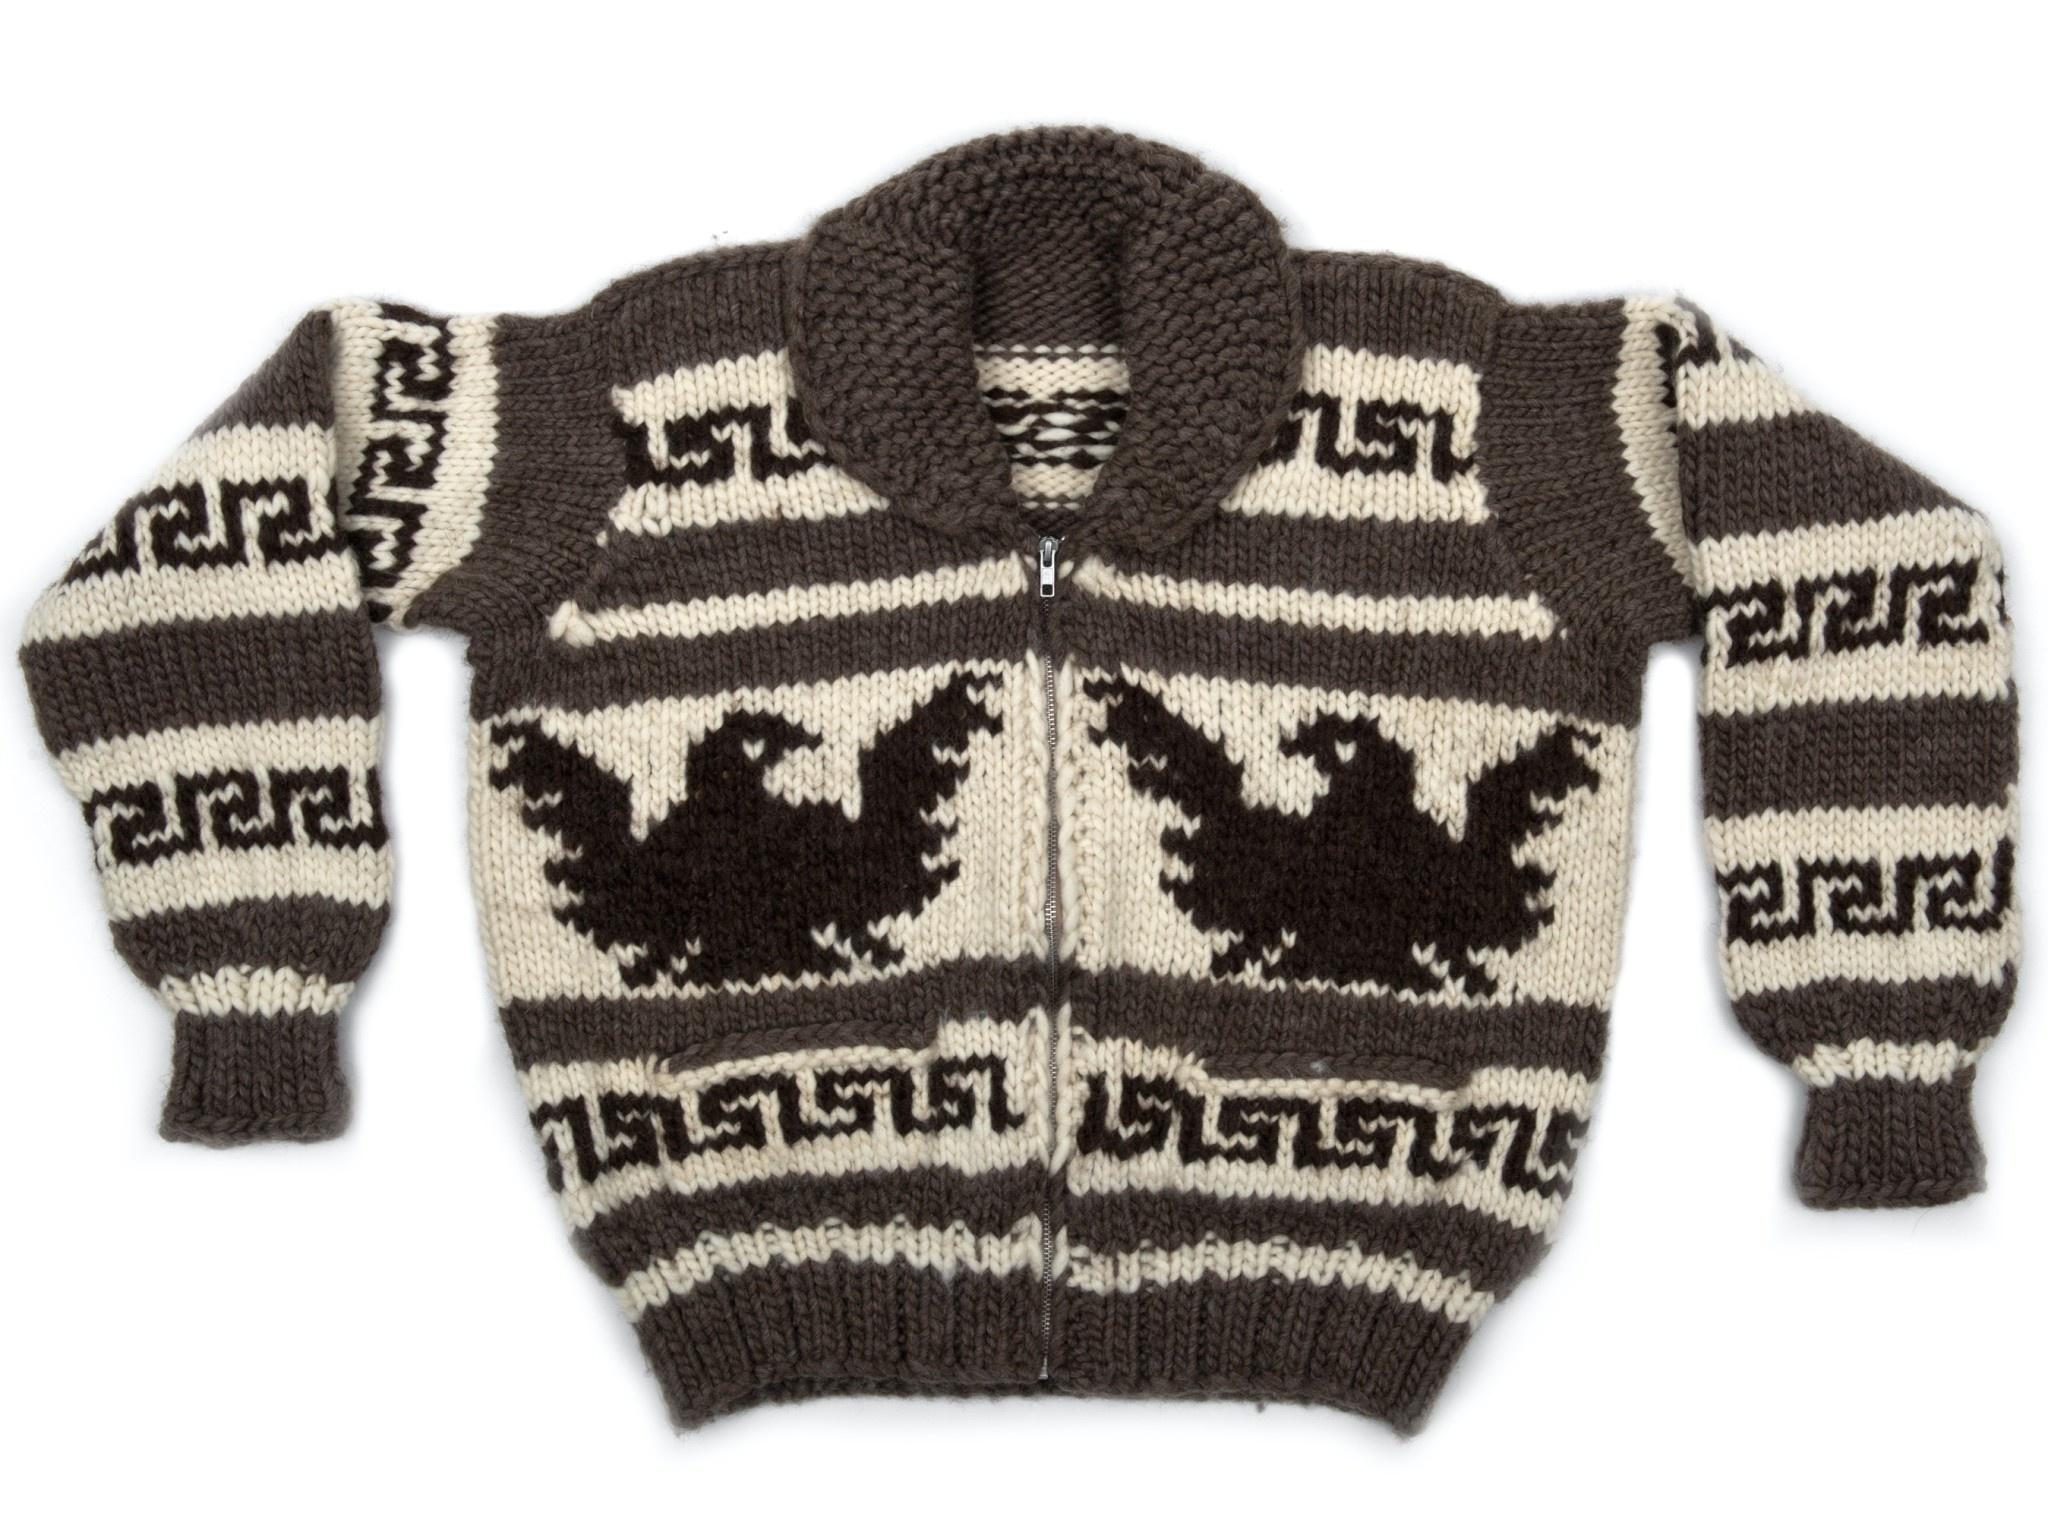 XXL Eagle Cowichan Sweater with Zipper